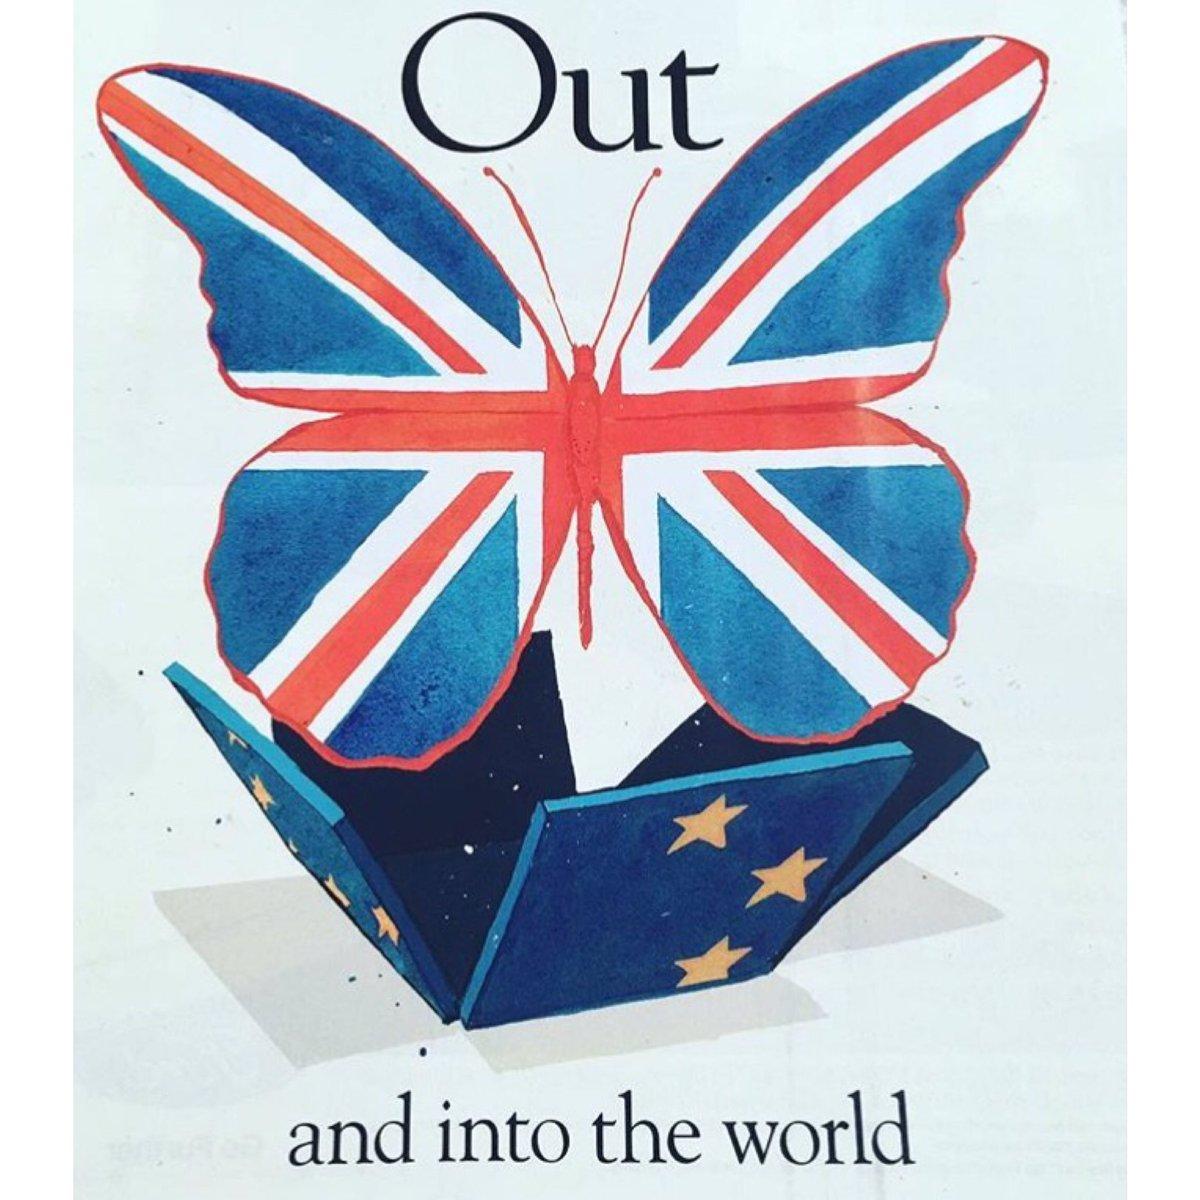 Beautiful graphics: Beautiful sentiment #VoteLeave #Brexit https://t.co/8sN9Q3WARr